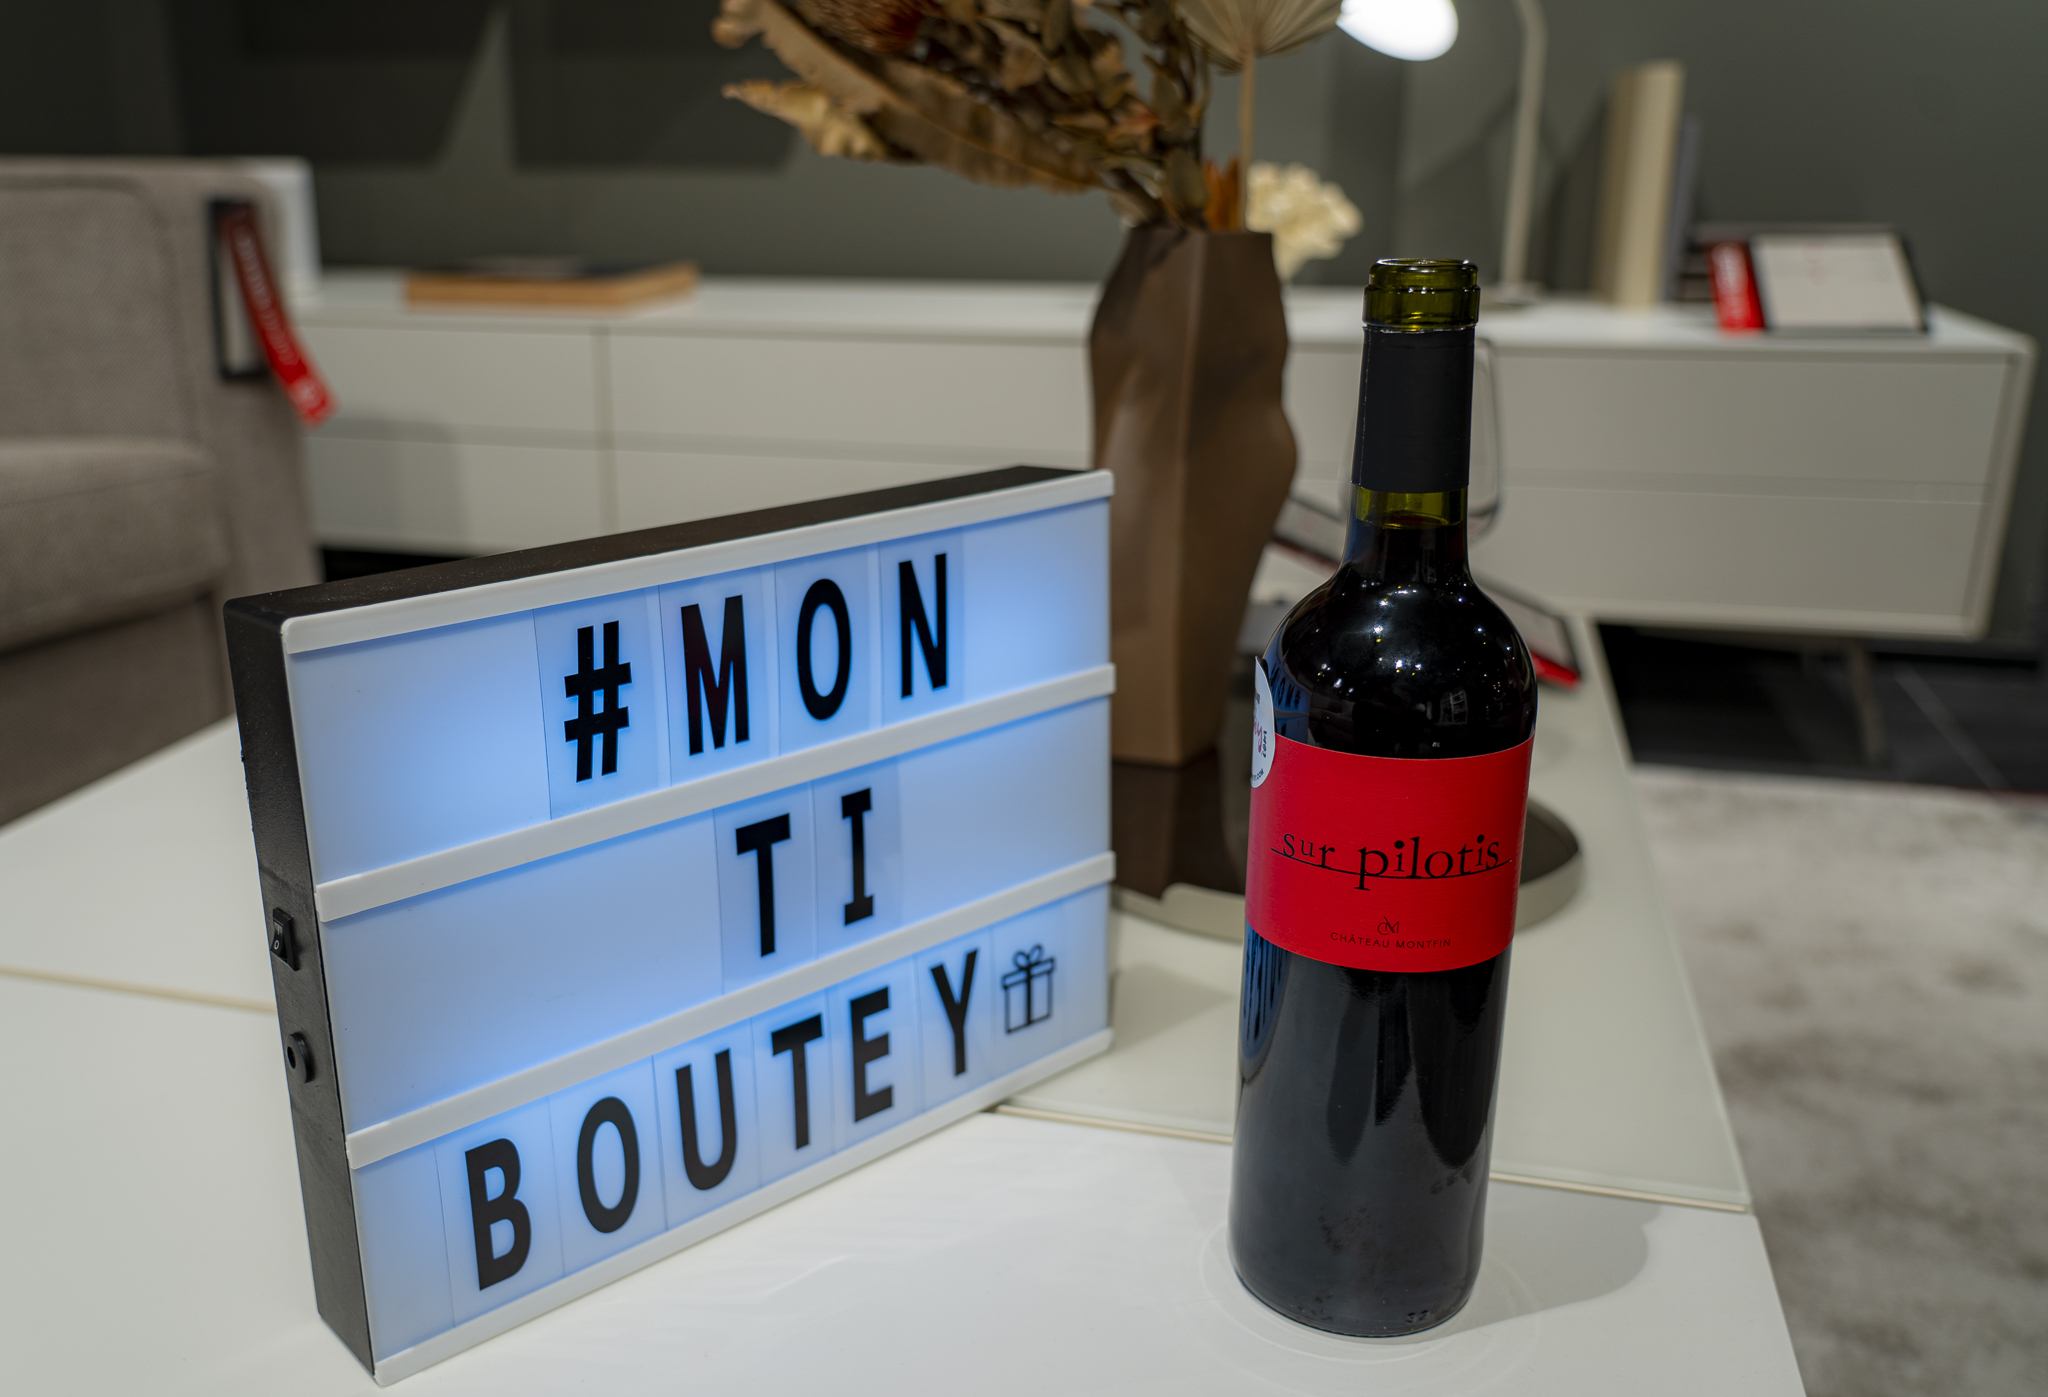 Dégustation BoConcept - Mon Ti' Boutèy